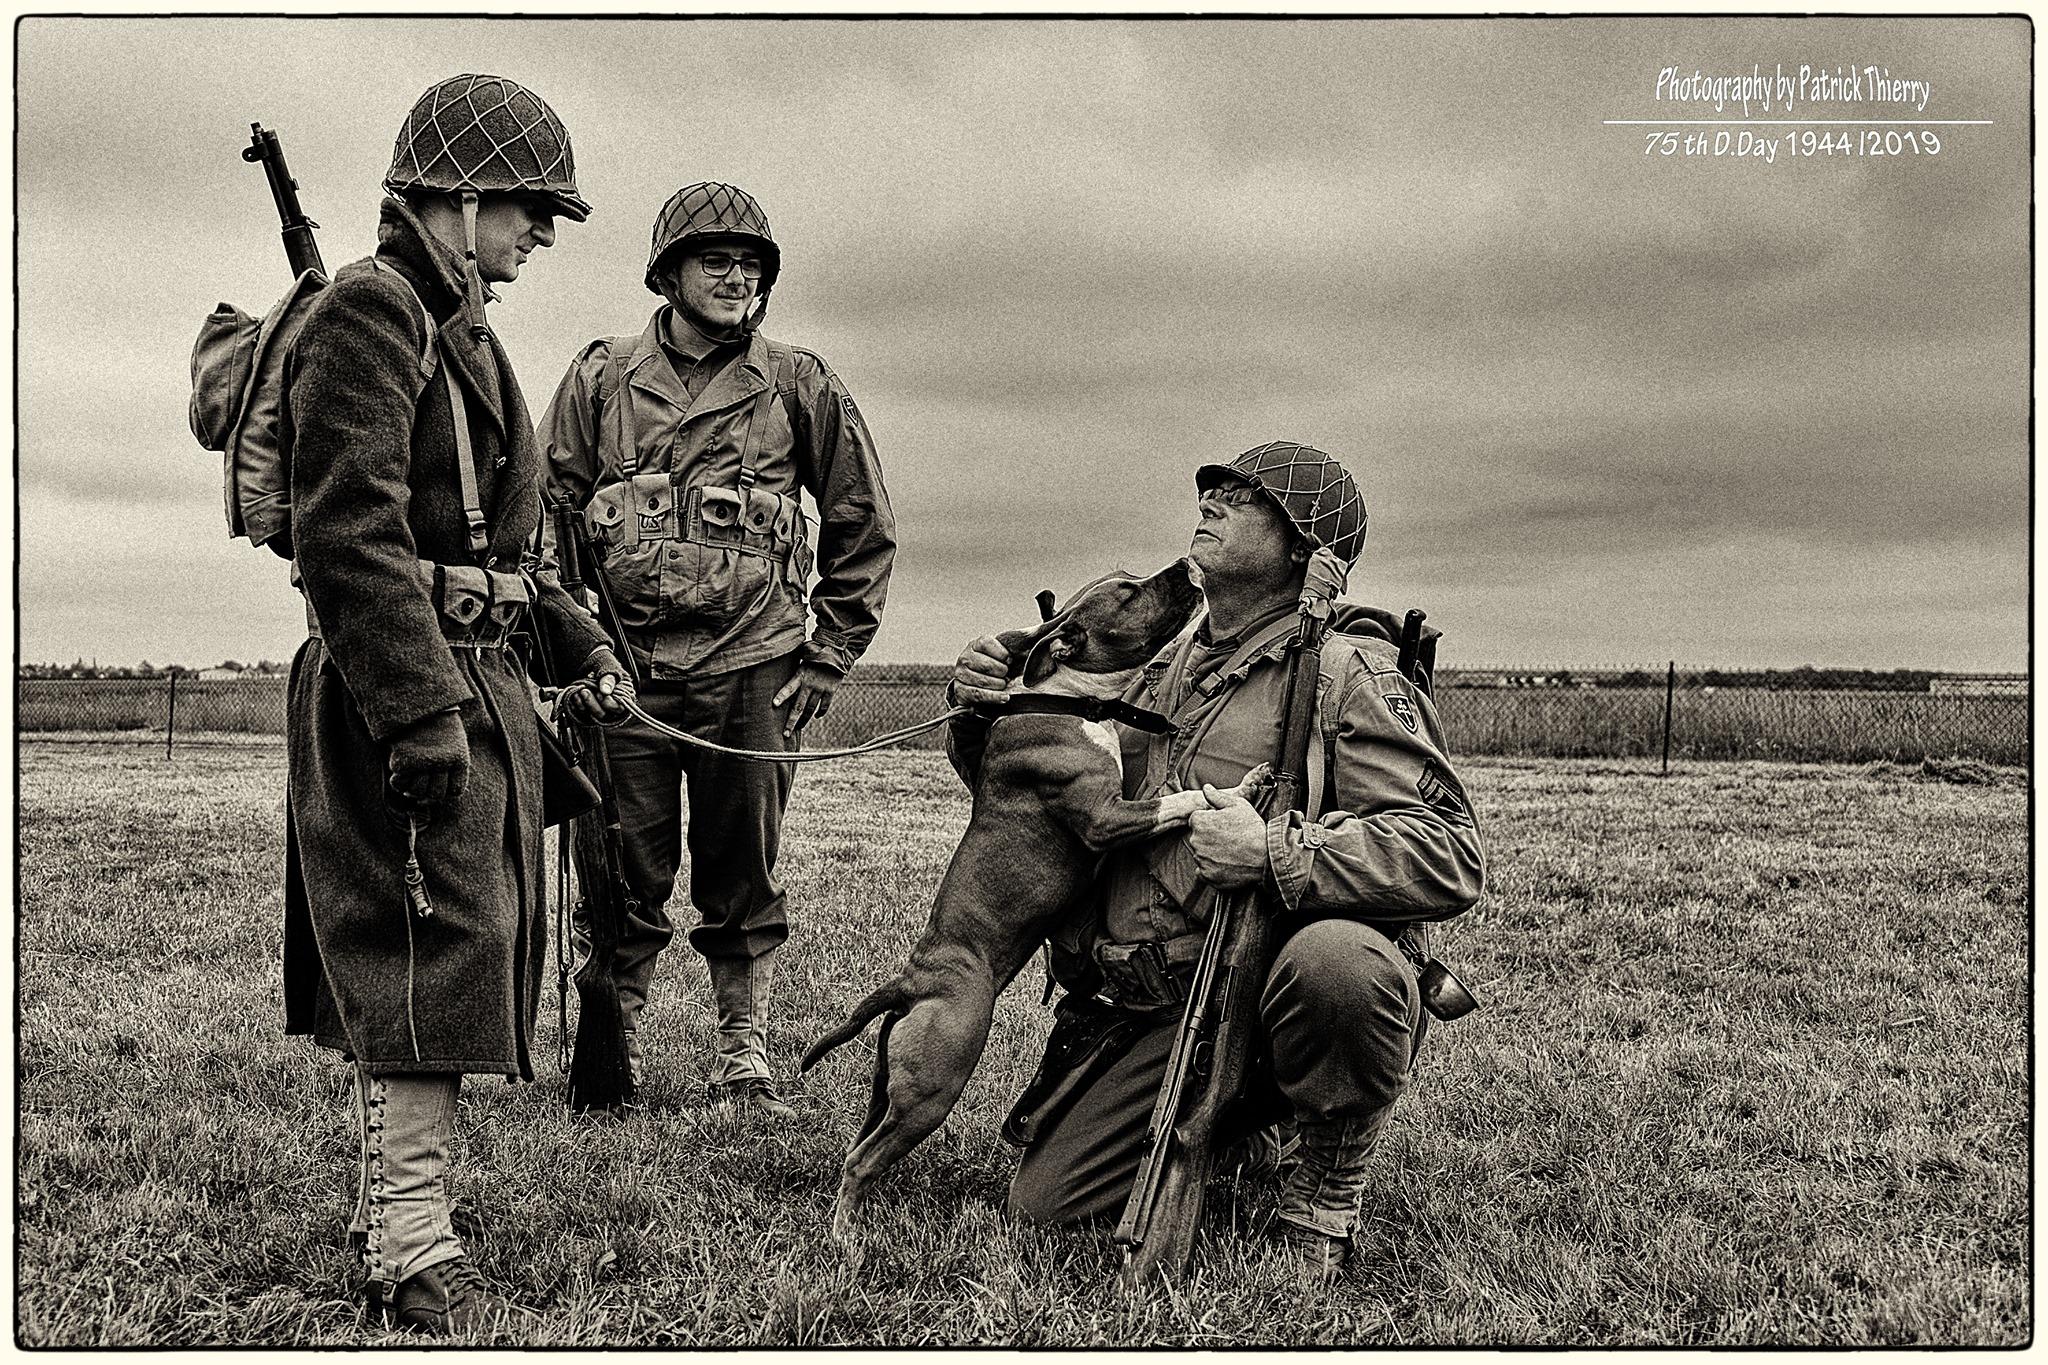 0015_Patrouille_Américaine_79TH_MEMORY_G